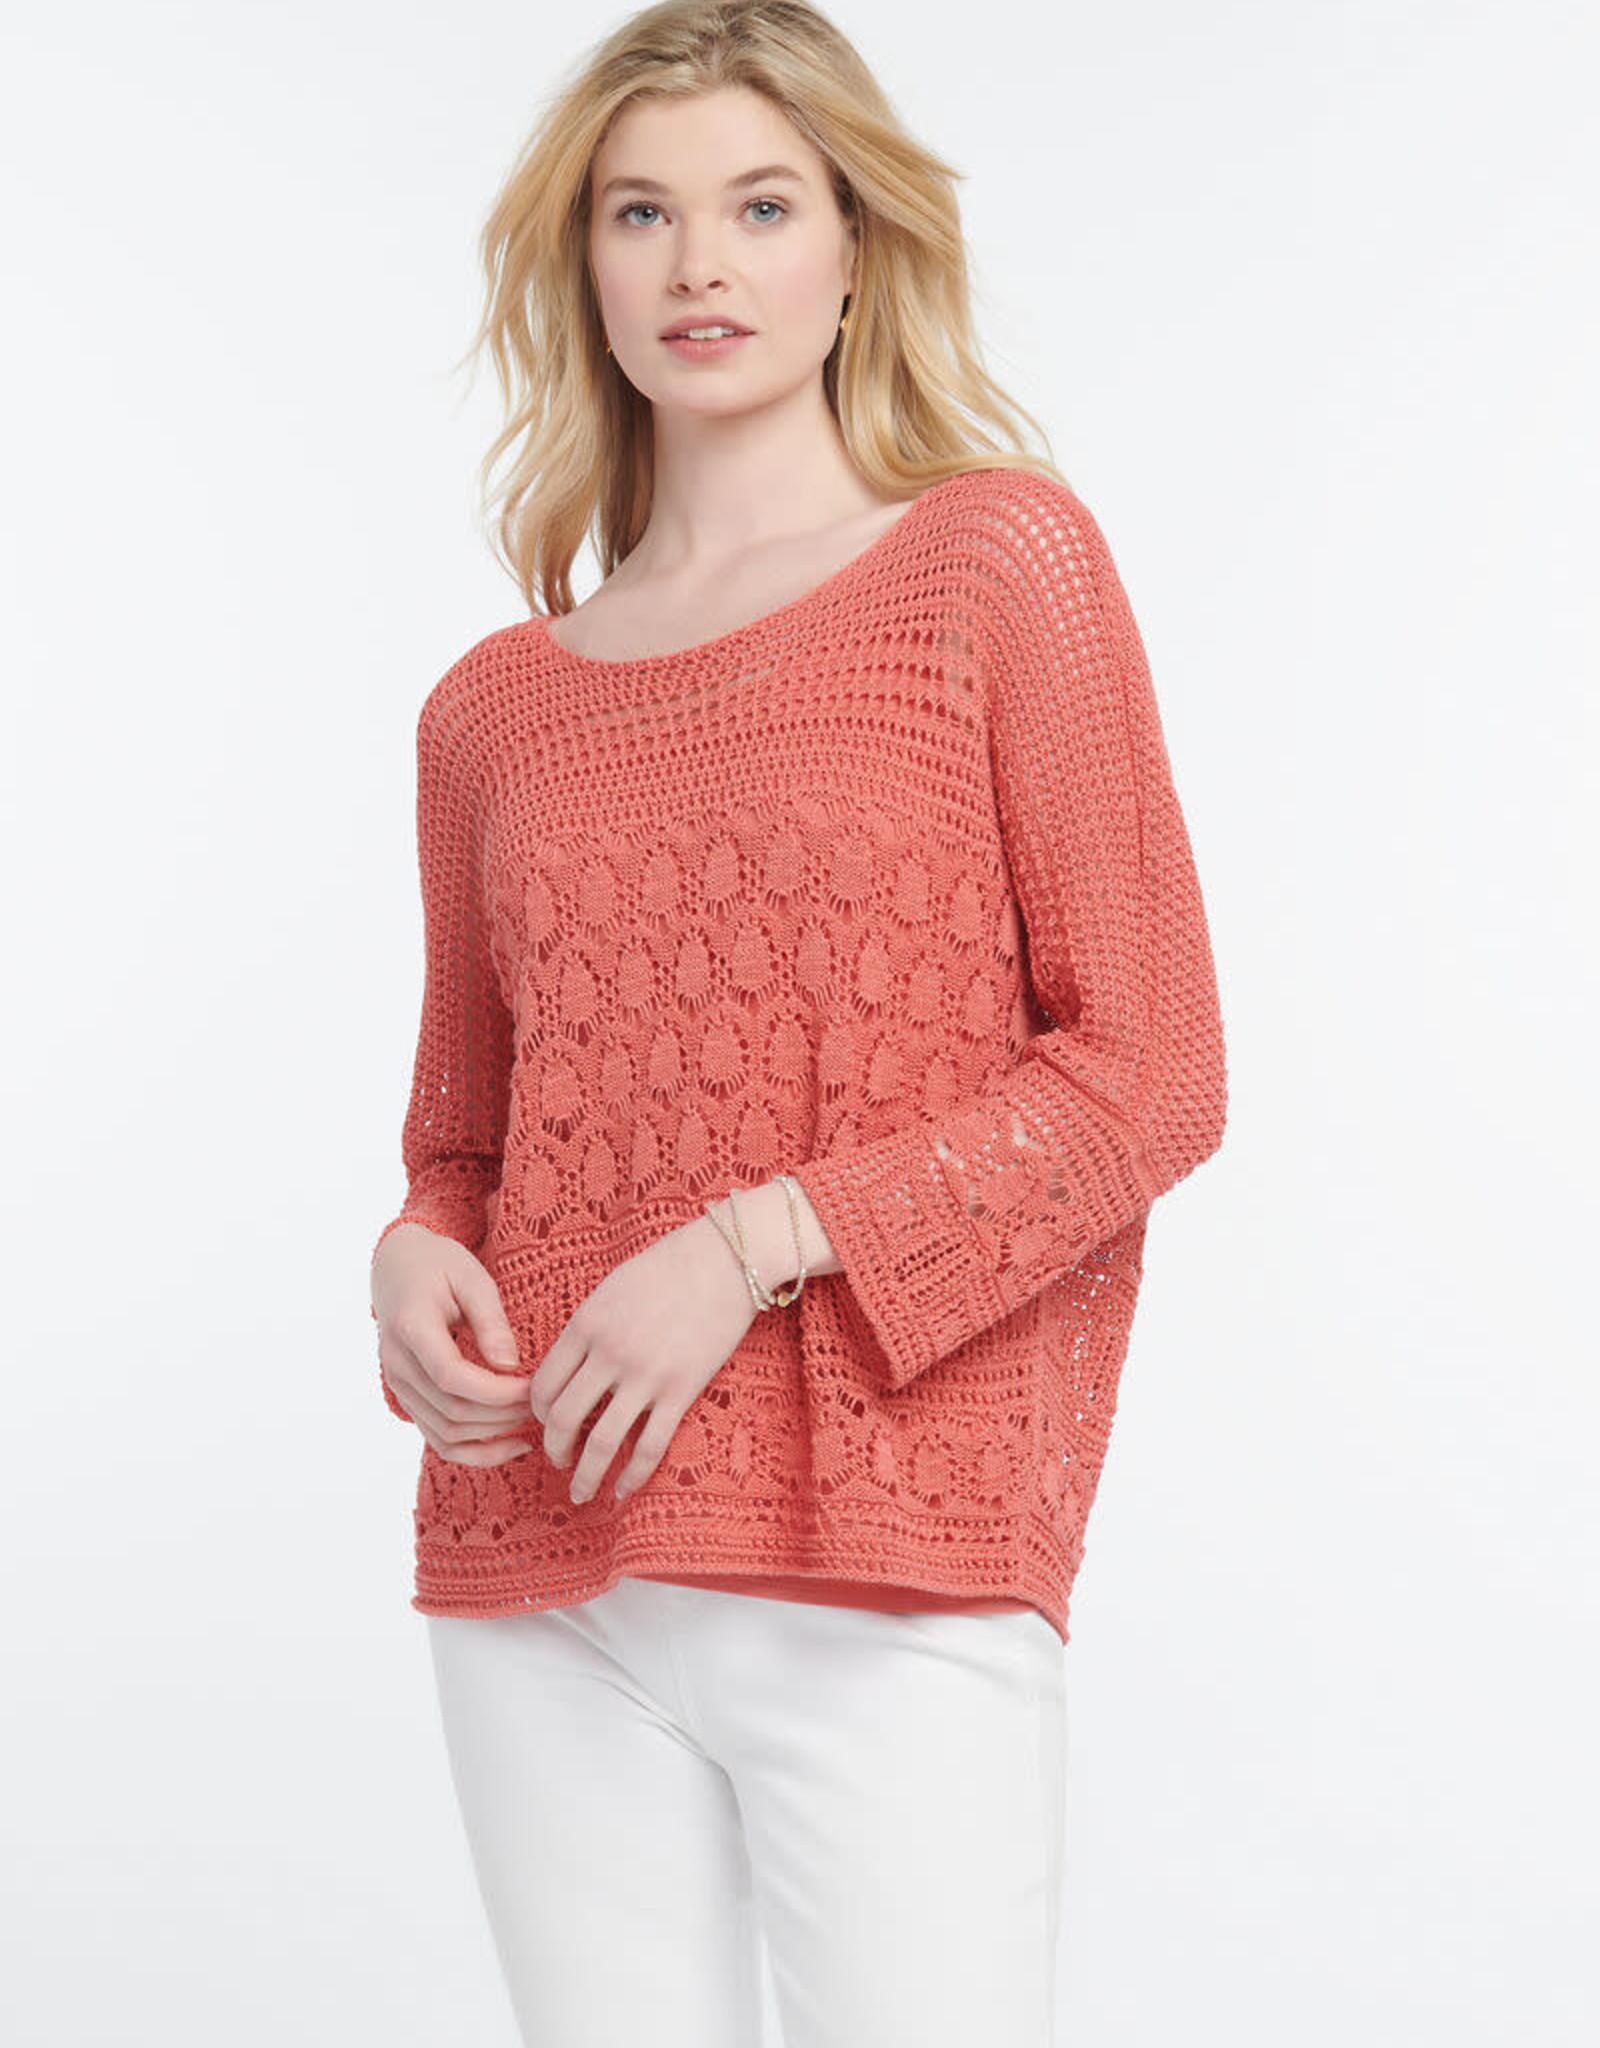 Nic & Zoe Row Boat Sweater